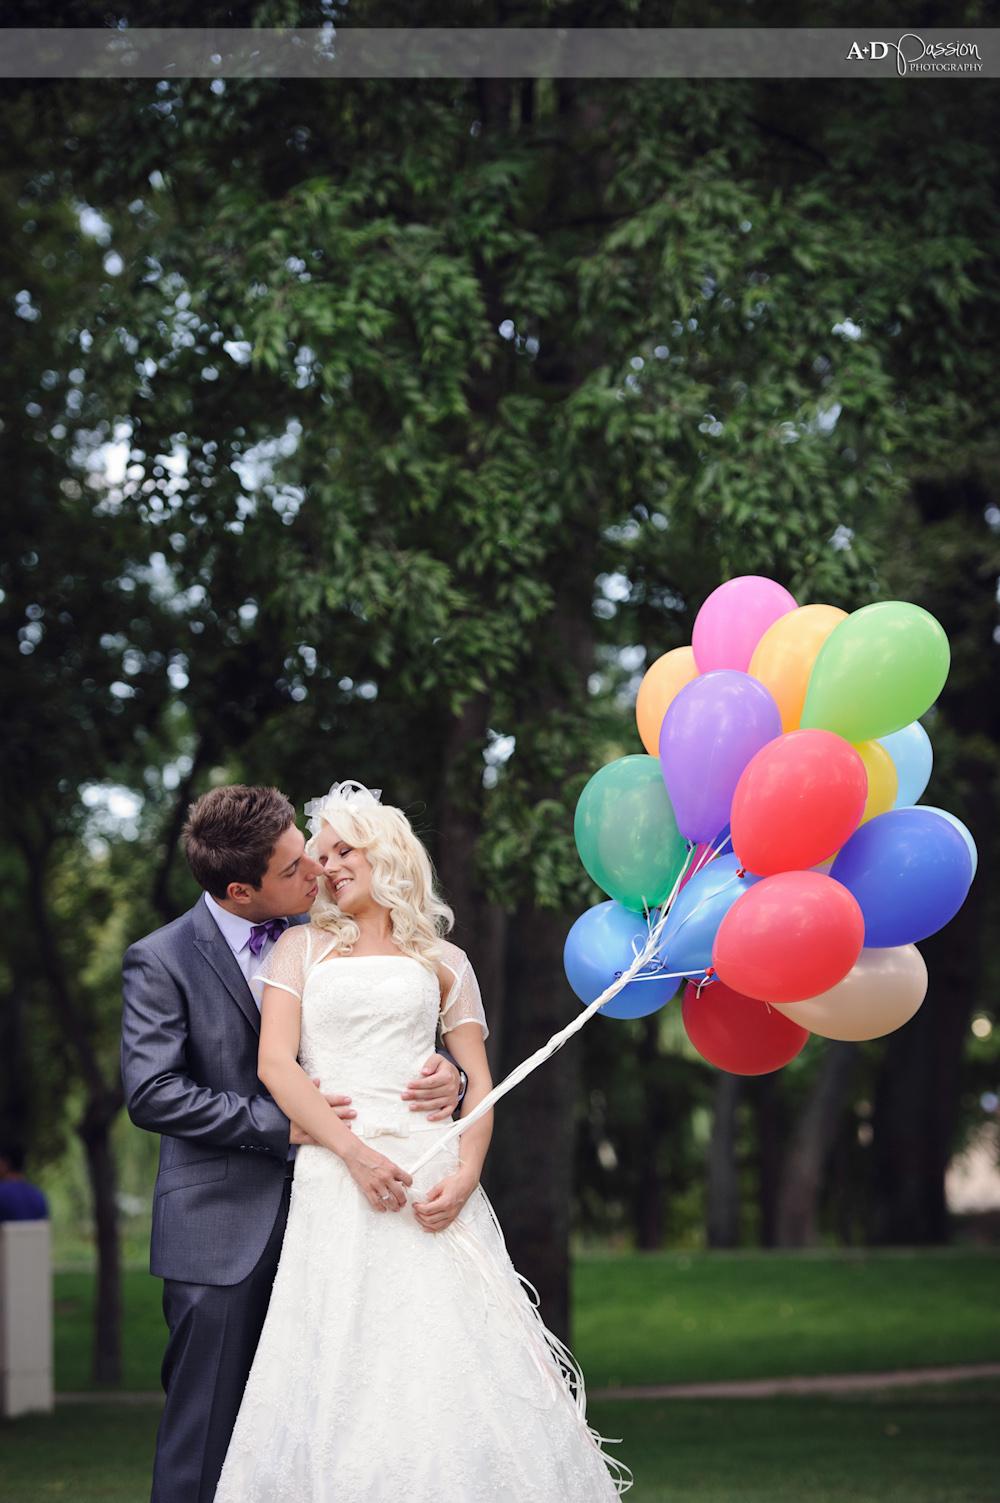 AD Passion Photography | 20120905_fotograf-profesionist-nunta-timisoara_anastasiia-si-sergiu-nunta_0044 | Adelin, Dida, fotograf profesionist, fotograf de nunta, fotografie de nunta, fotograf Timisoara, fotograf Craiova, fotograf Bucuresti, fotograf Arad, nunta Timisoara, nunta Arad, nunta Bucuresti, nunta Craiova